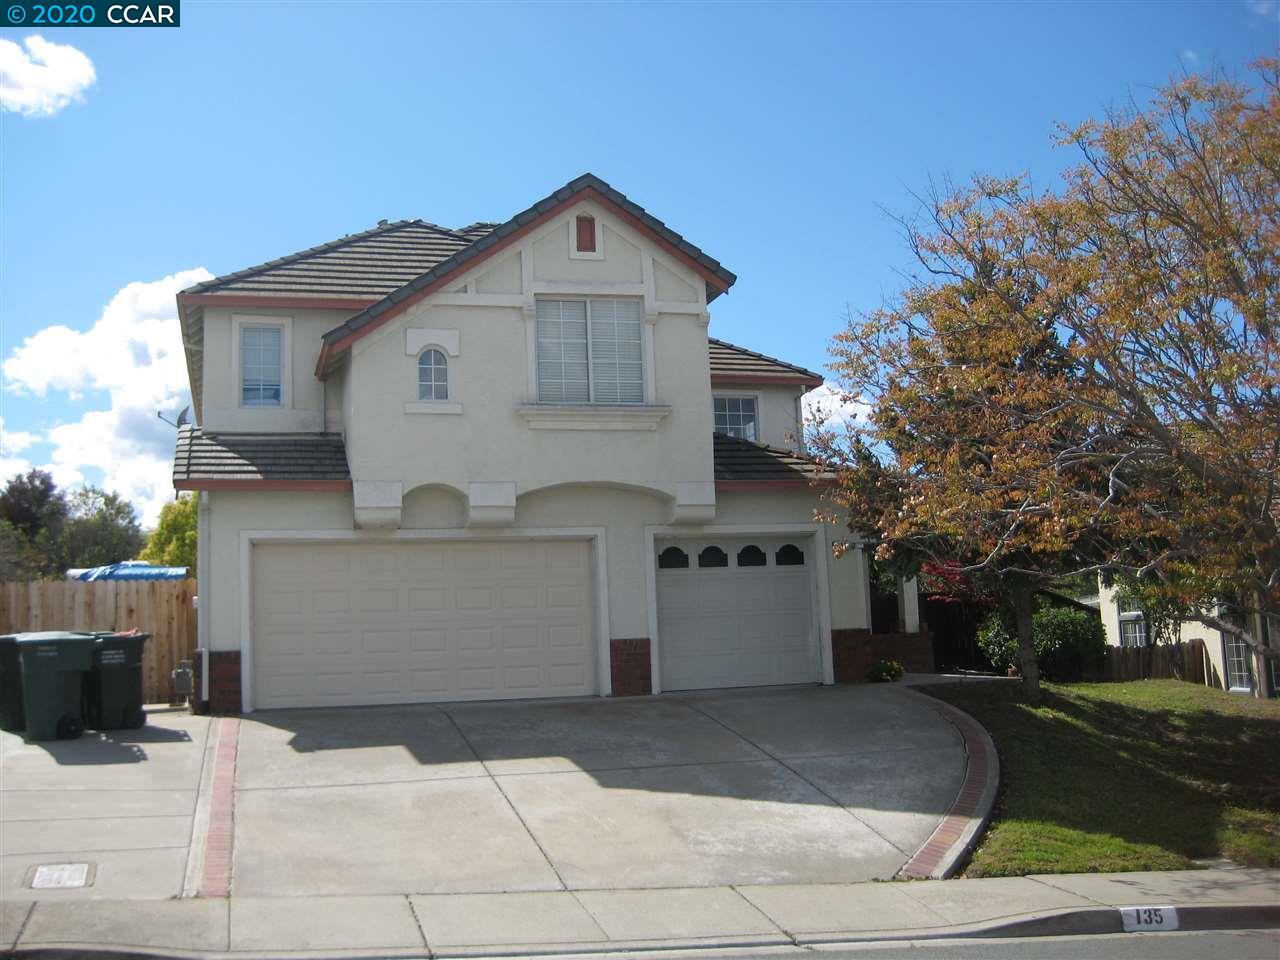 135 Greenmeadow Cir Pittsburg, CA 94565-7330